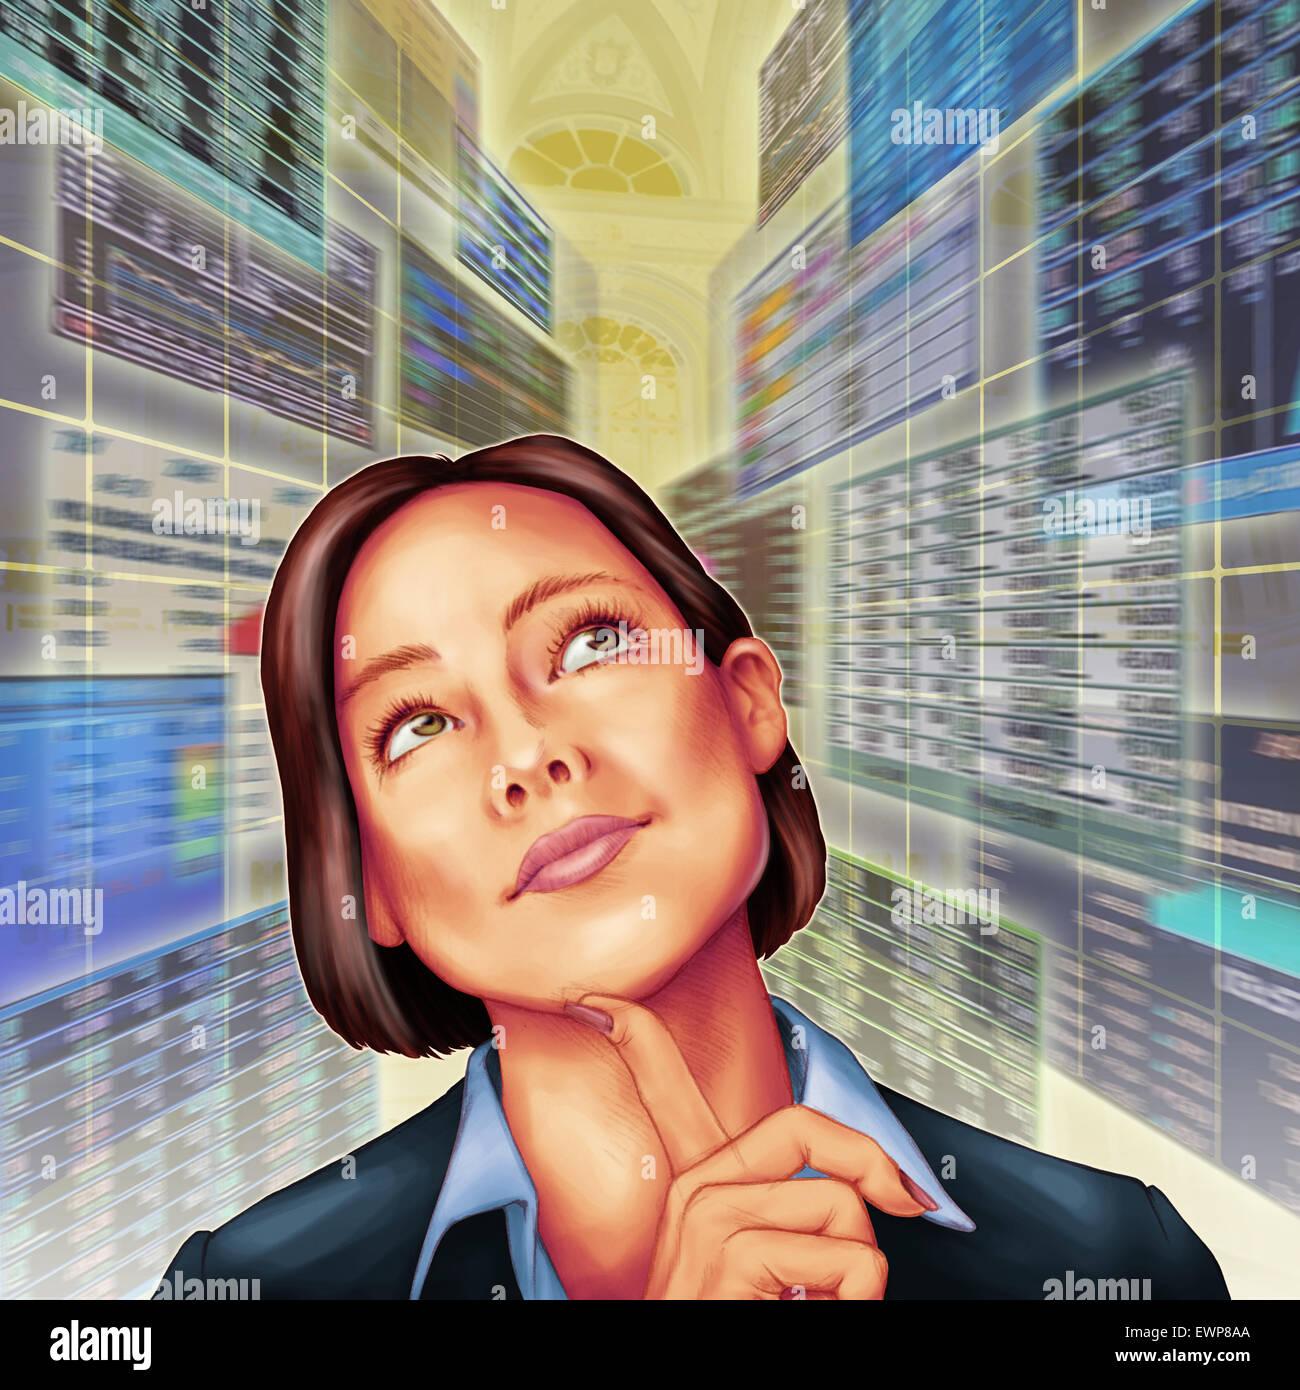 Image d'illustration de businessman day Dreaming in server room Photo Stock